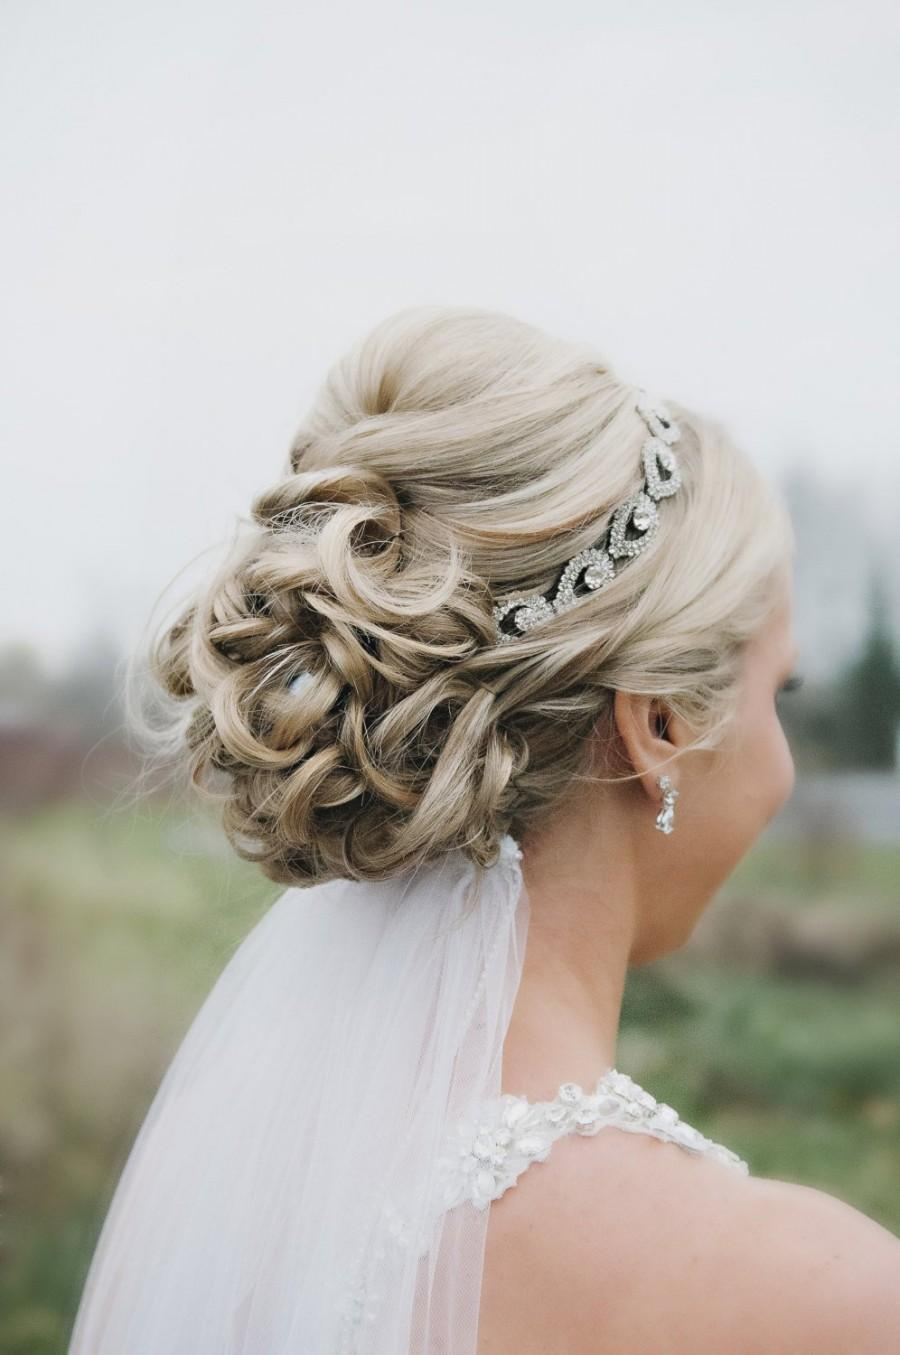 Wedding - Holiday Headband, Rhinestone Bridal Headpiece, Bridal Hair Piece, Teardrop Rhinestone Headband, Bridal Headband, Wedding Headband, Holiday